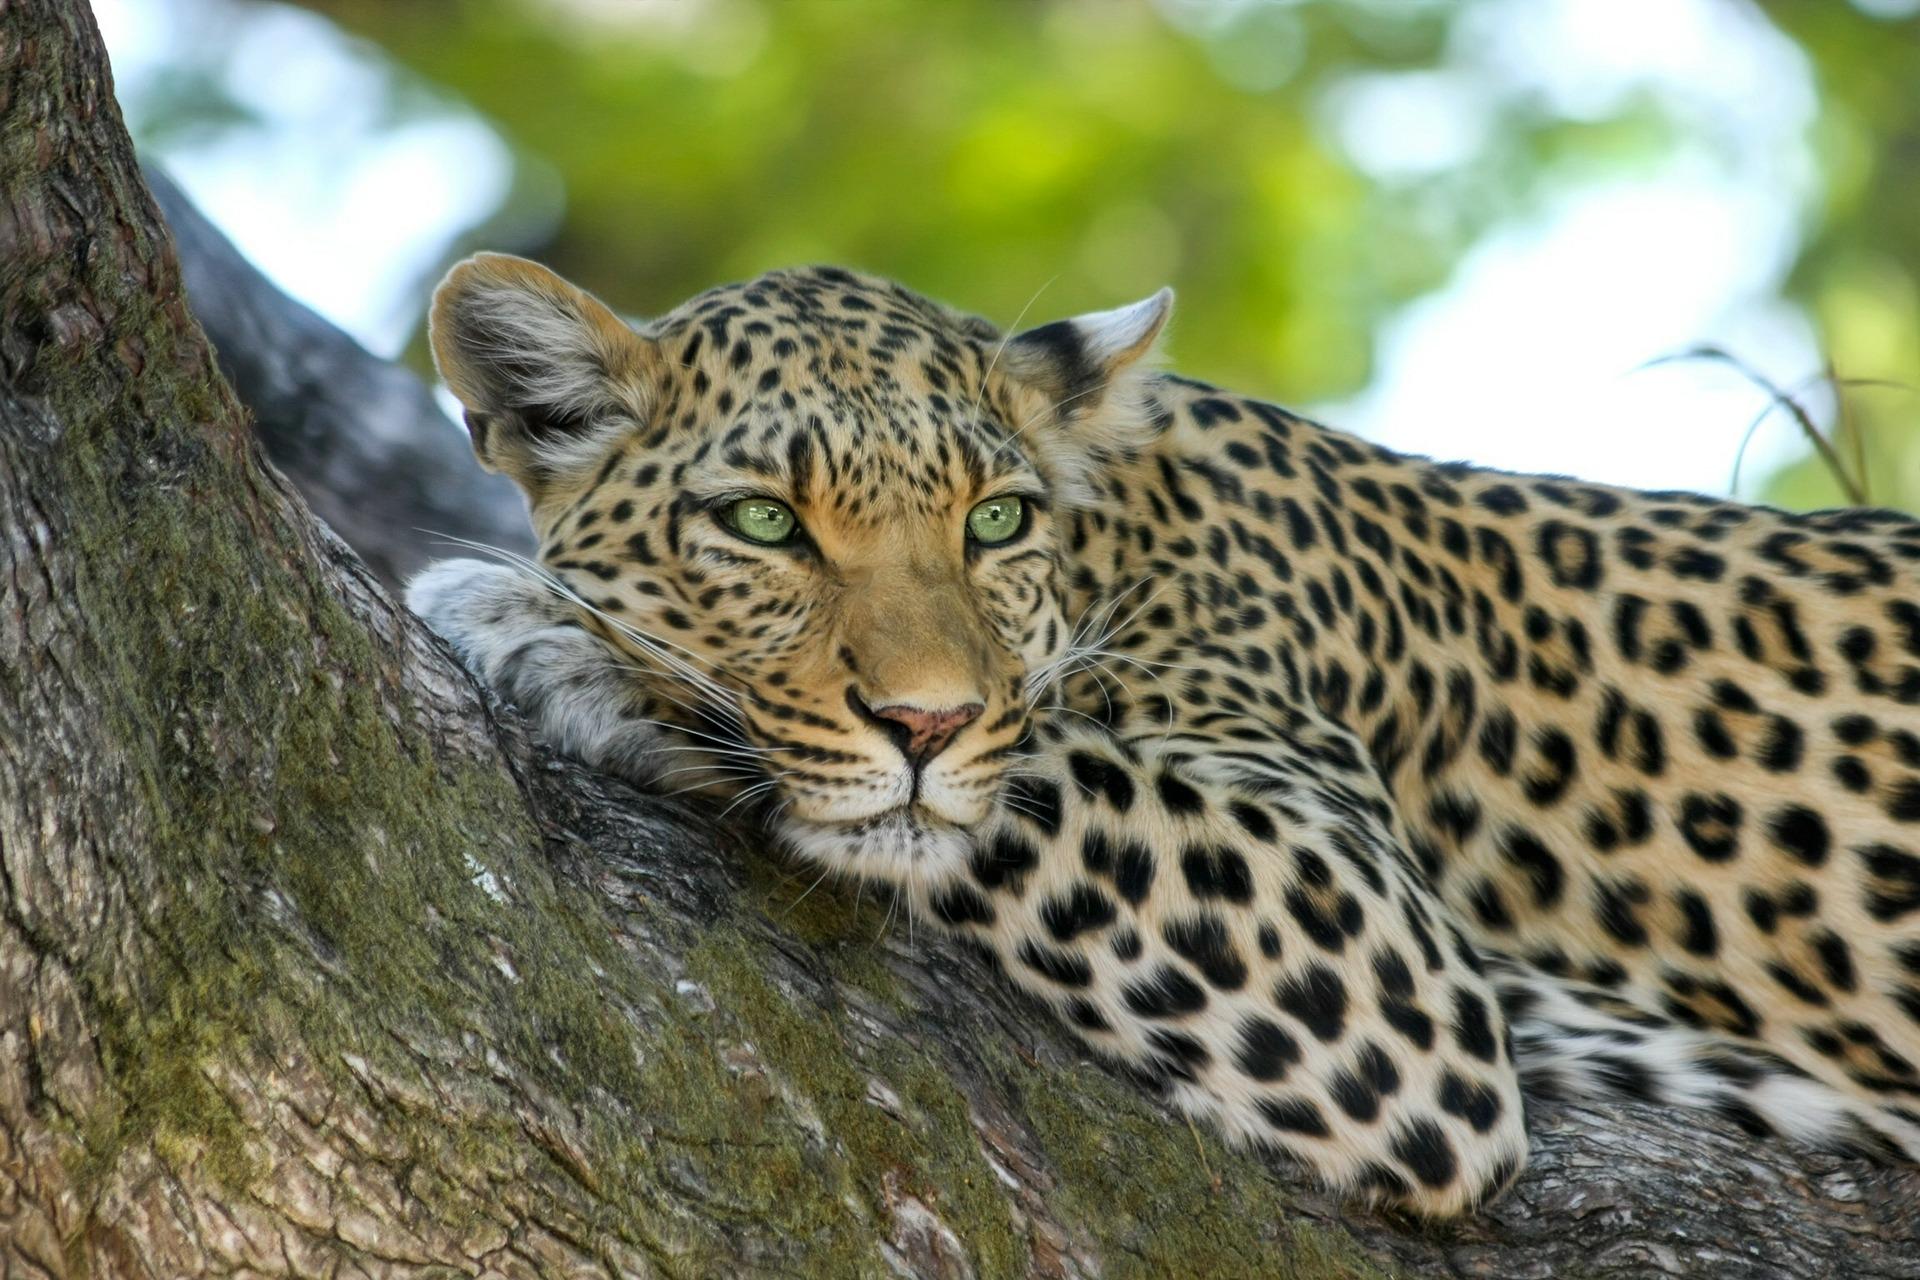 Day 09 - Yala National Park